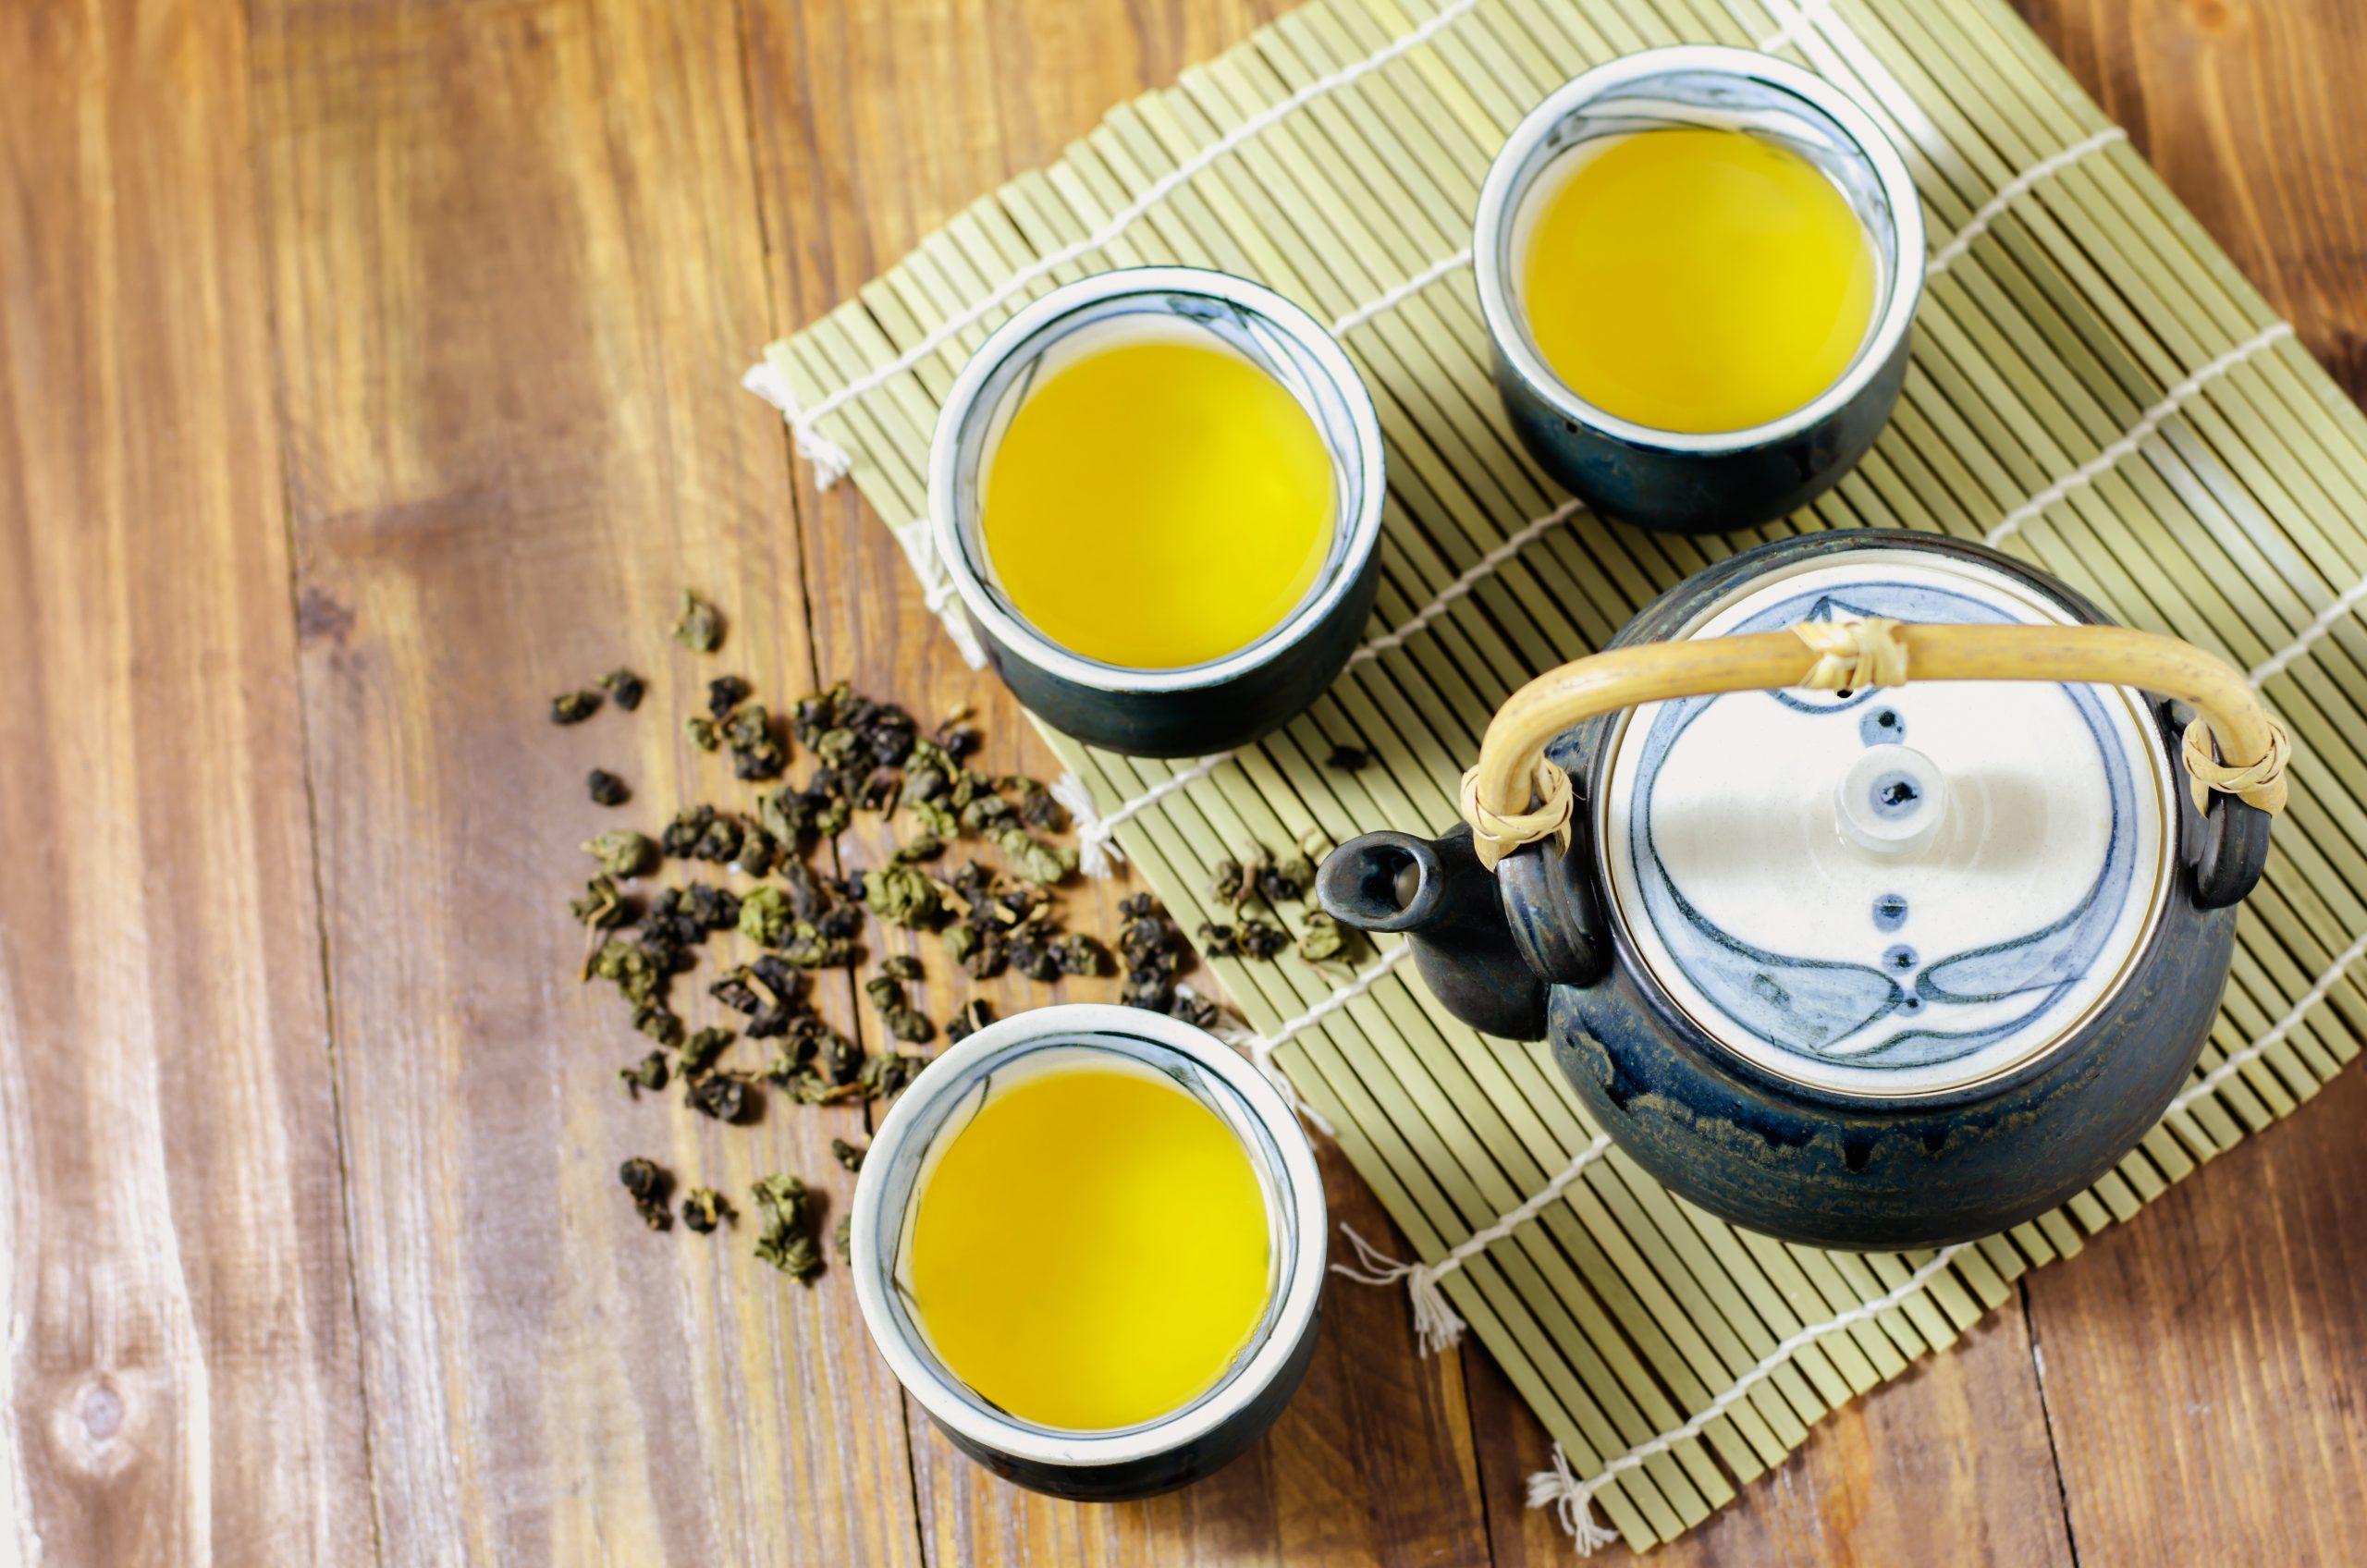 Tetera De Acero Inoxidable Para Estufa Ideal Para Preparar Té Café Calientes